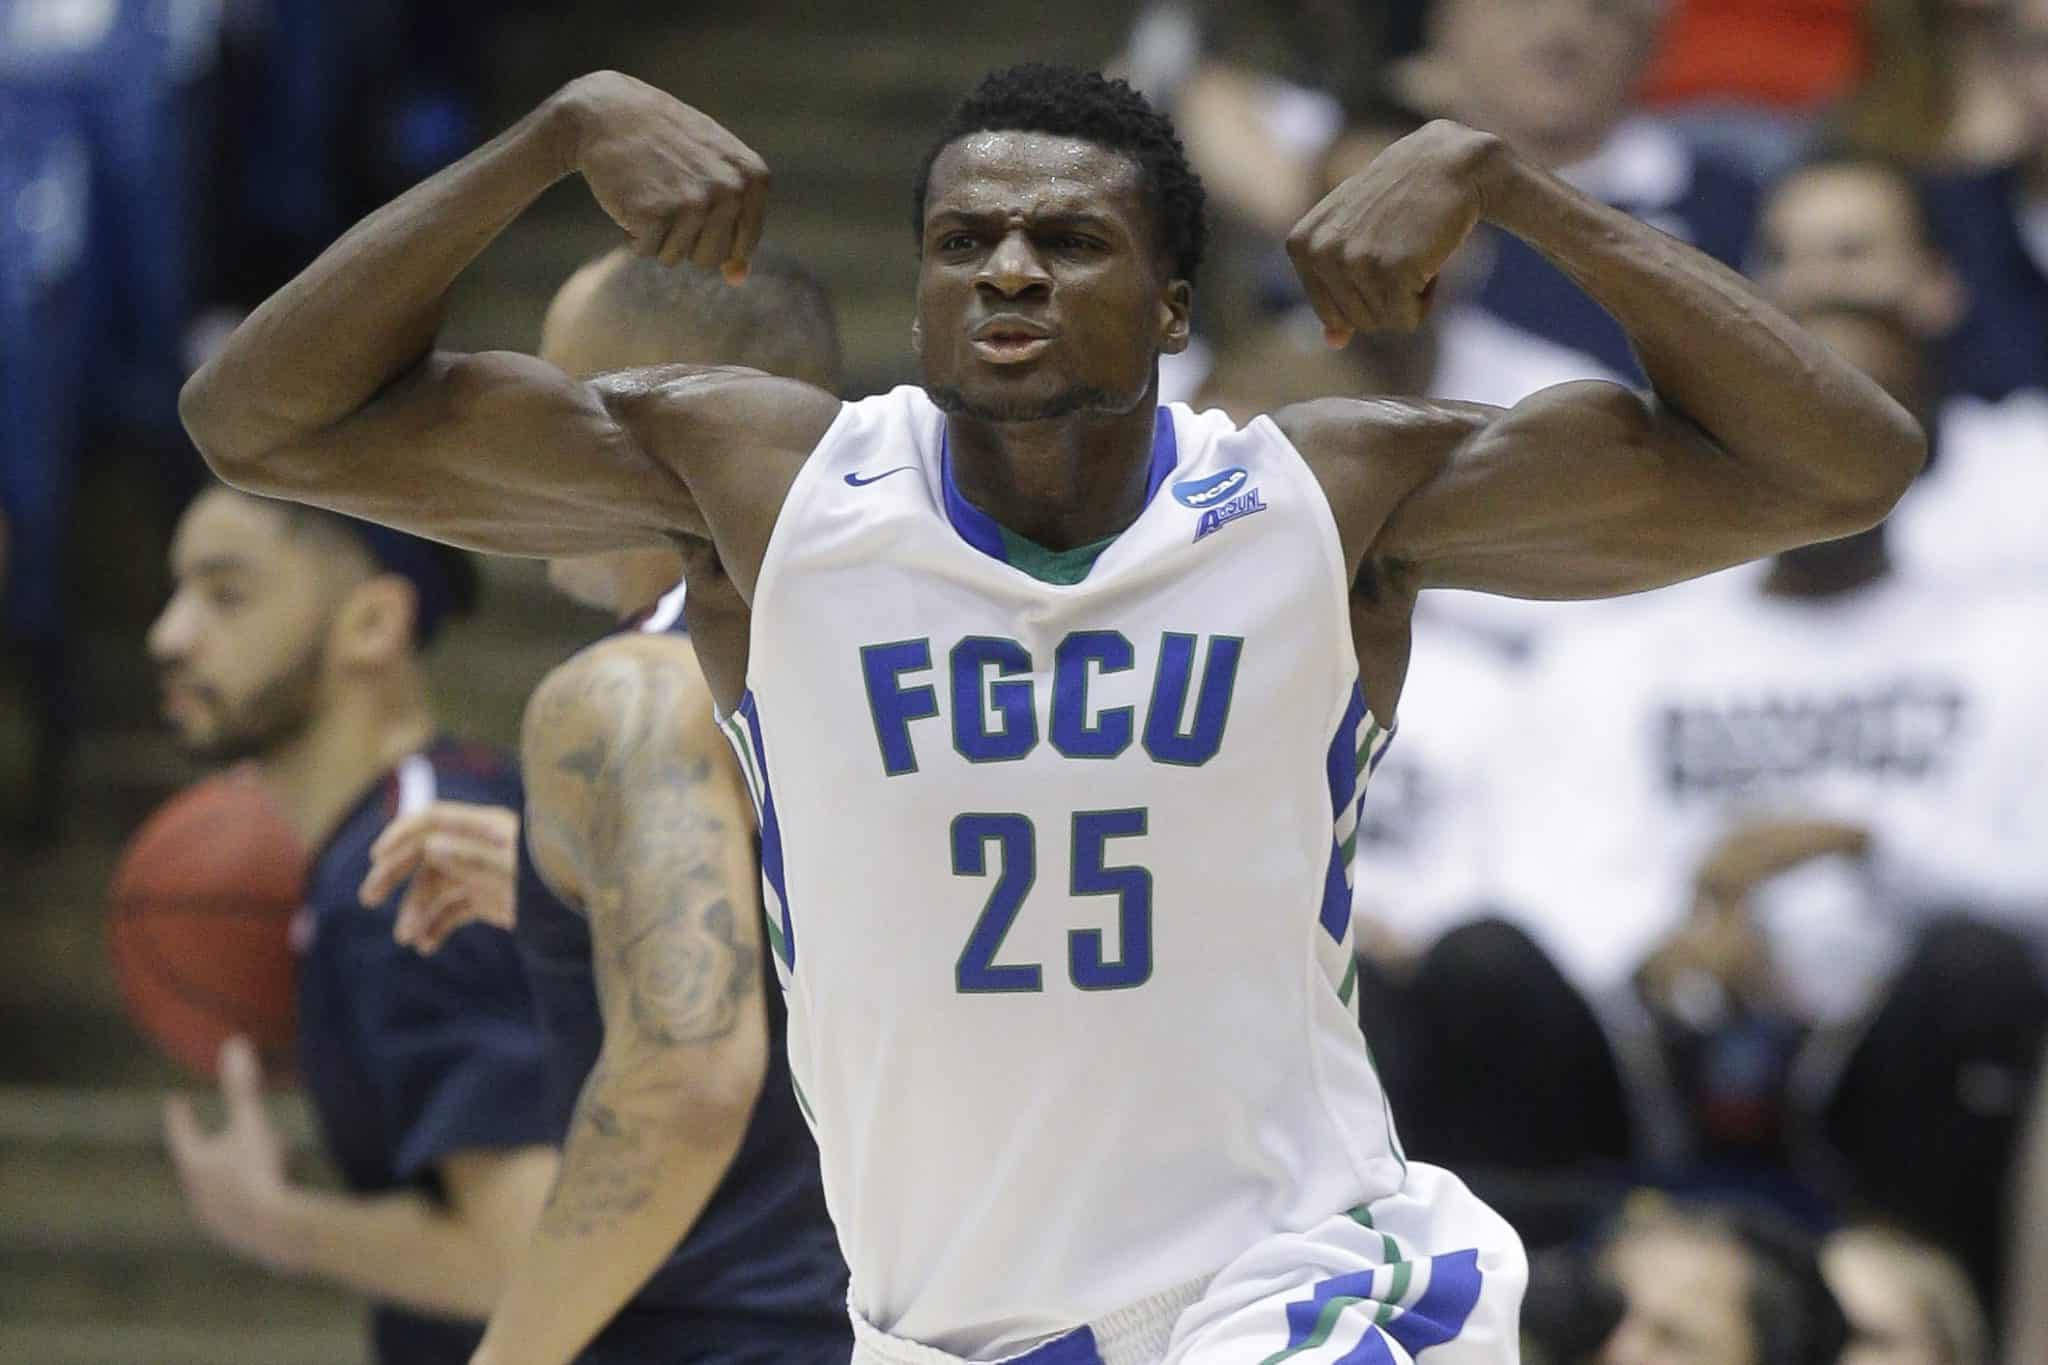 Ncaa basketball - Marc-Eddy Norelia - Florida Gulf Coast